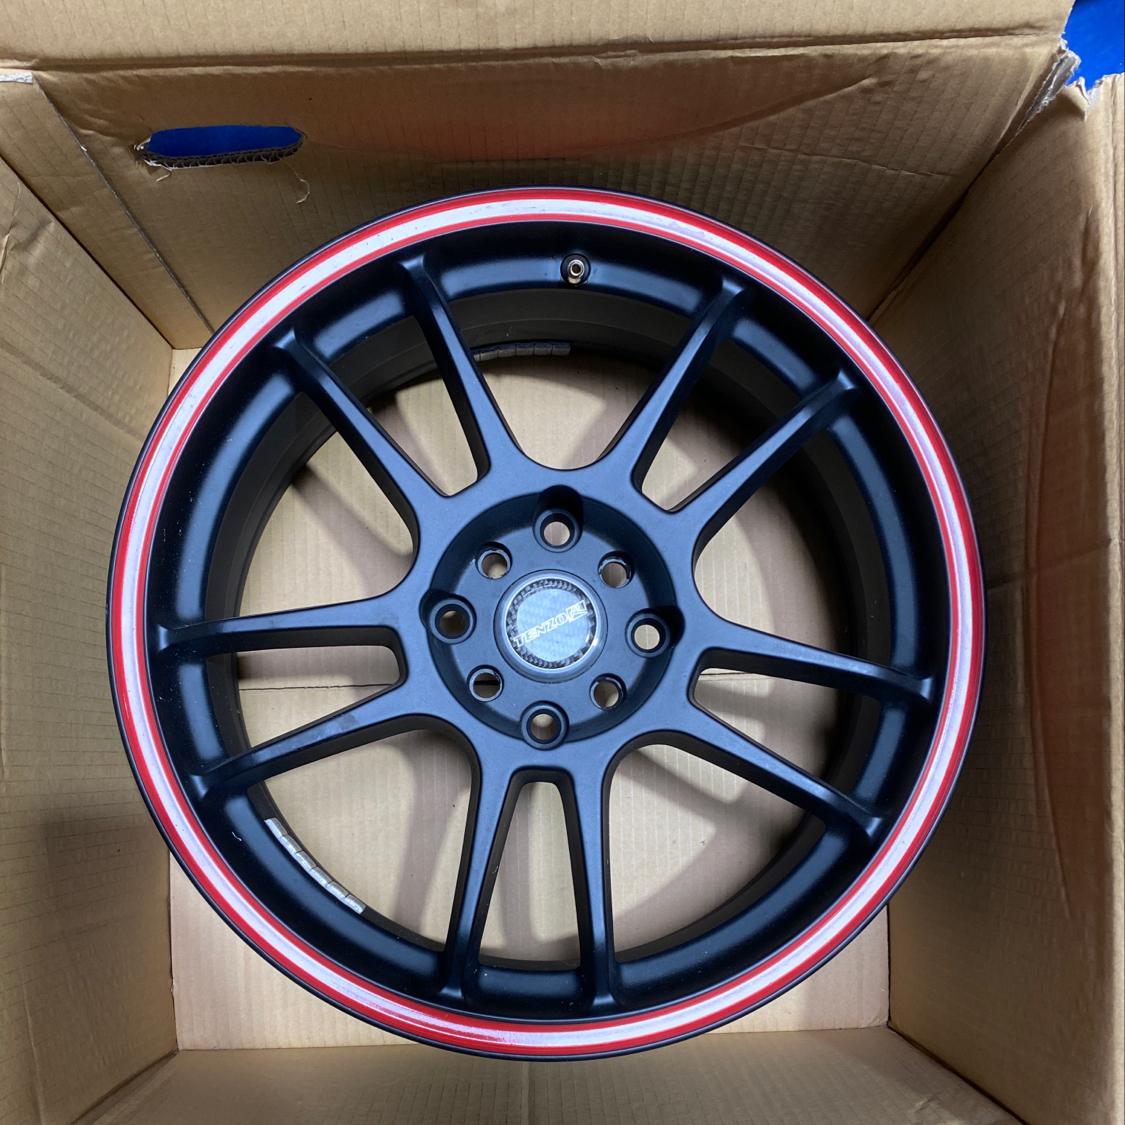 Tenzo Wheels 17x7 4x100/4x114.3 42mm Black Red Ring Set of 4 CLEARANCE